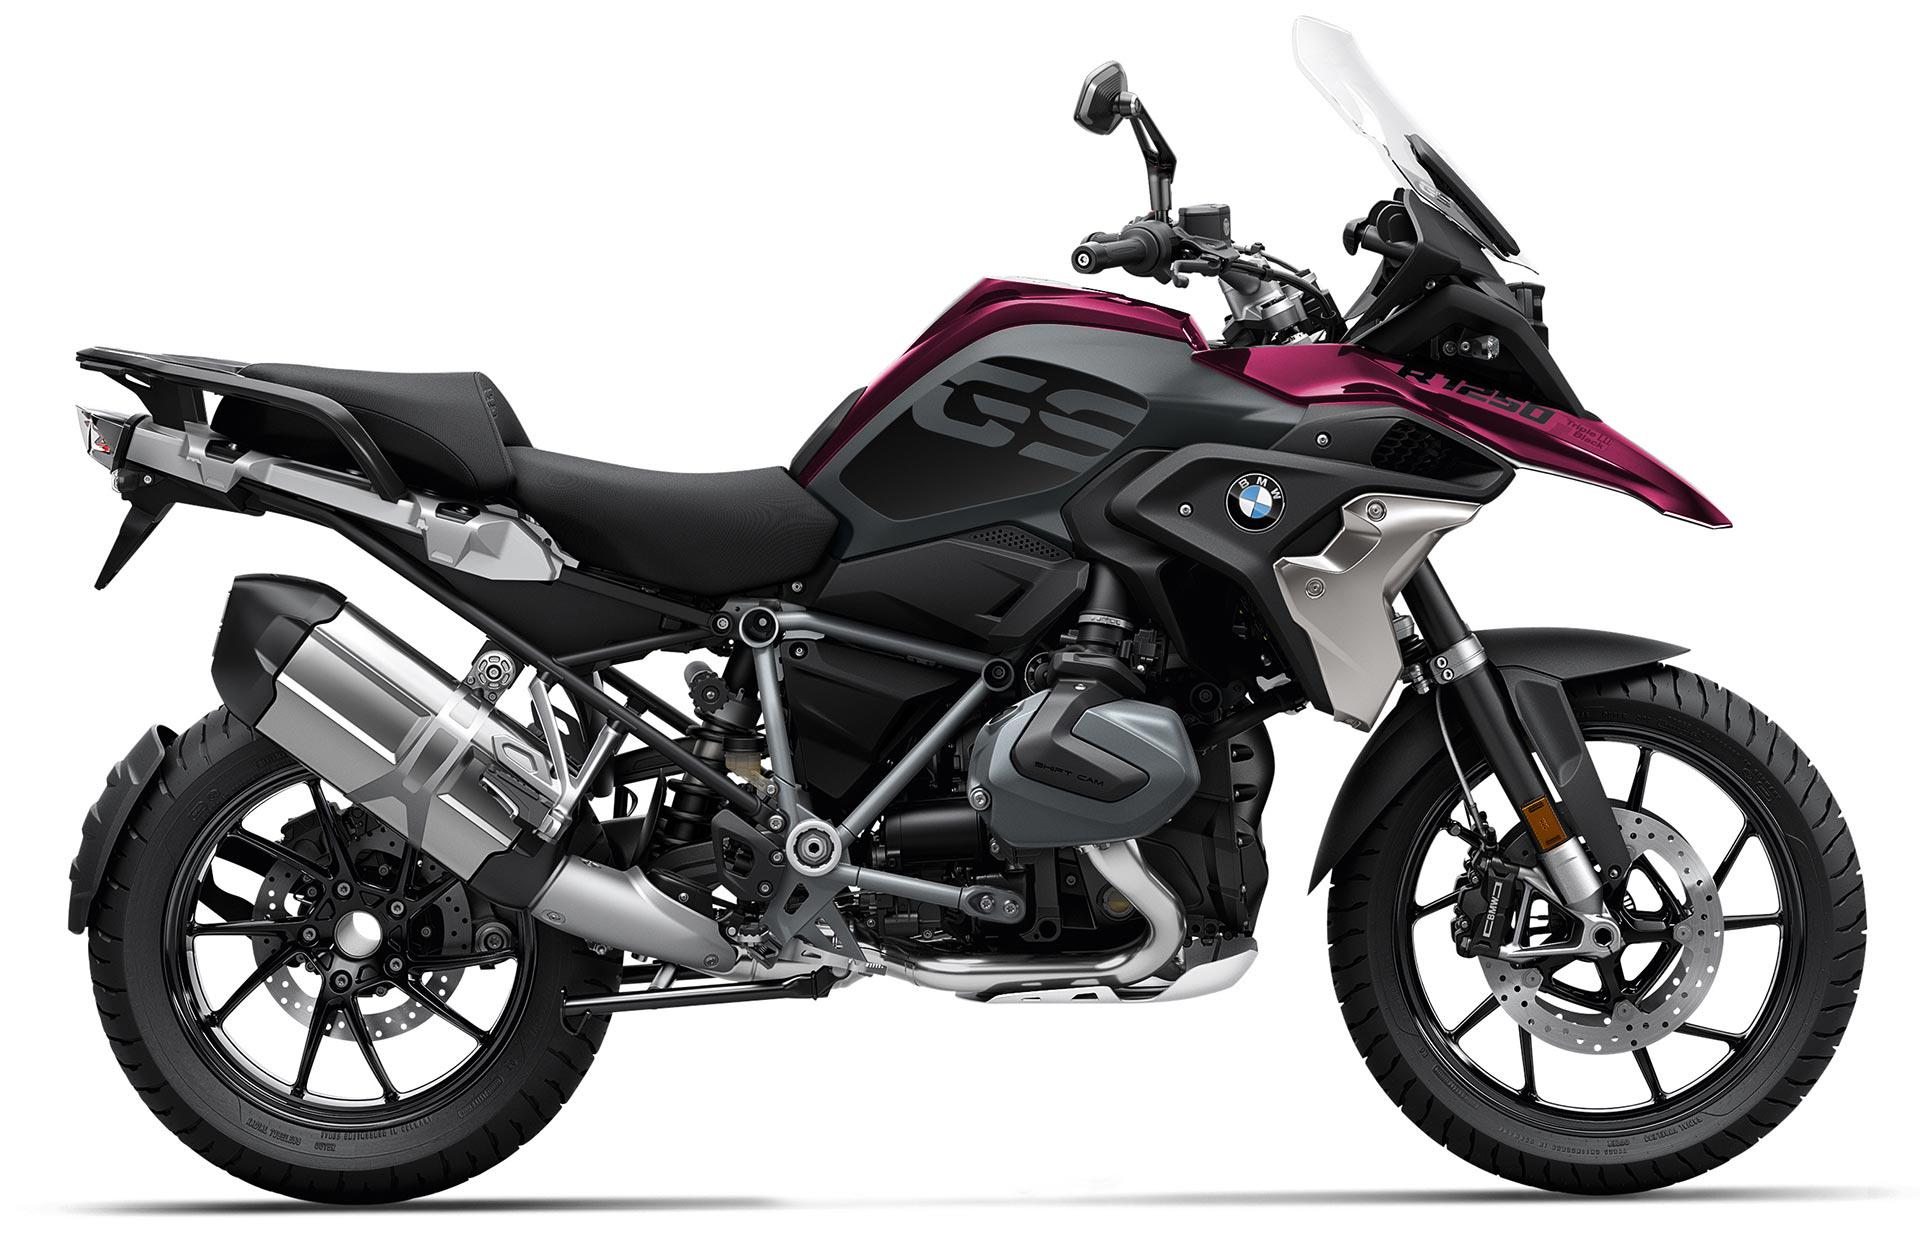 2021-BMW-R1250GS-TripleBlack-Brombeer.png